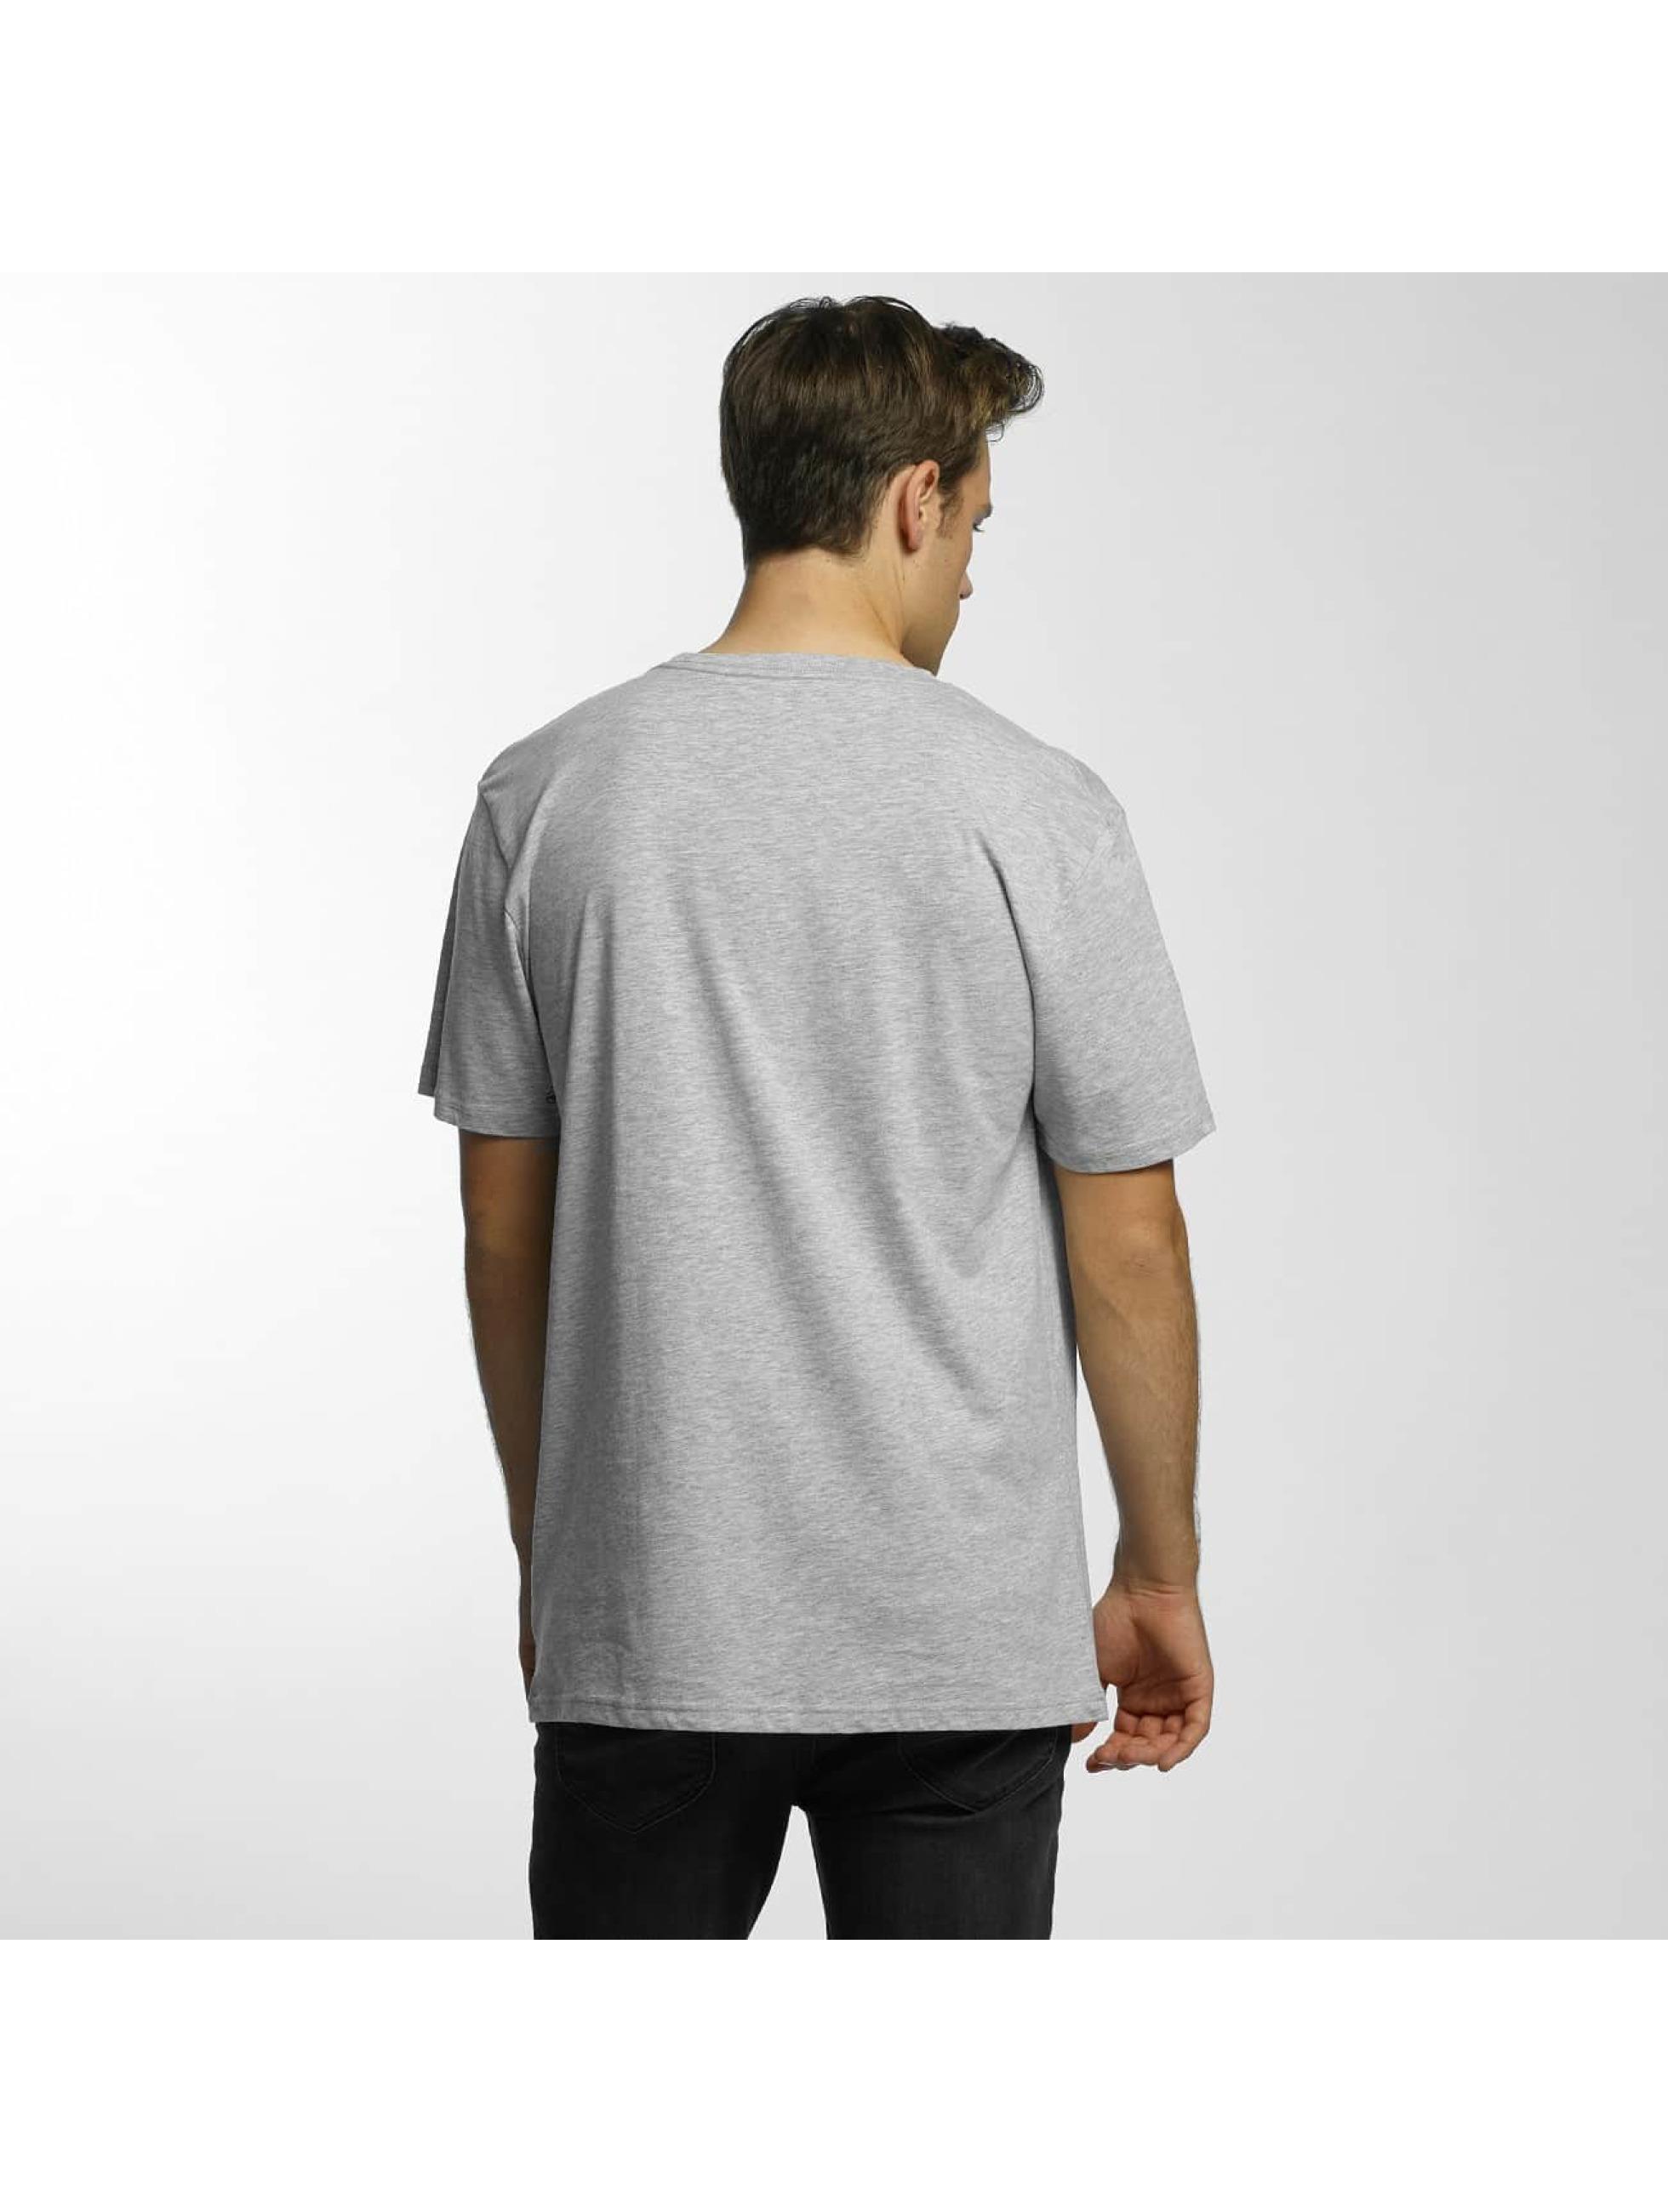 Volcom T-paidat Burnt Basic harmaa